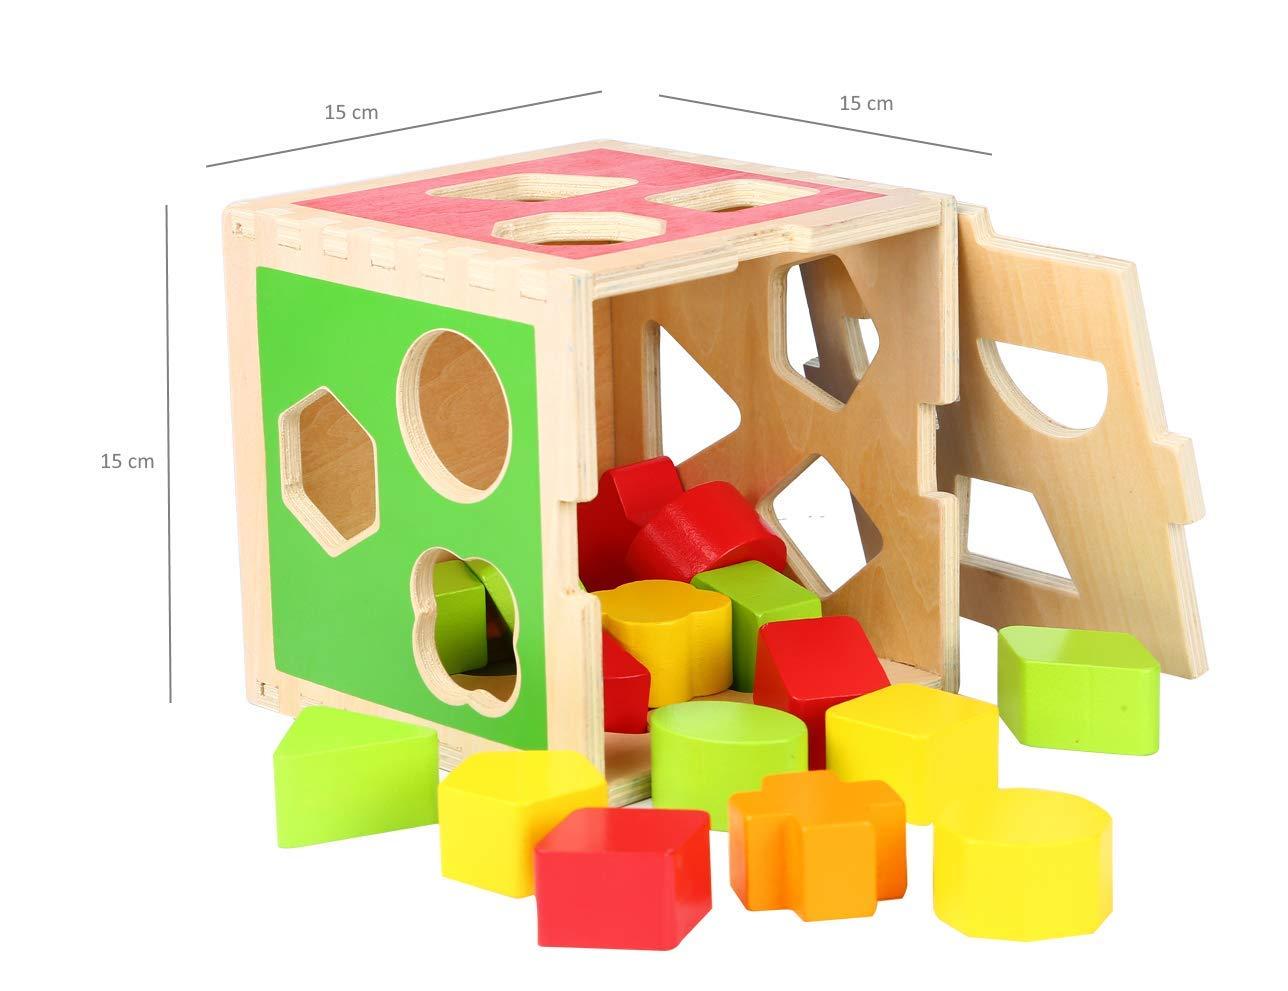 juguete para mejorar la logica infantil